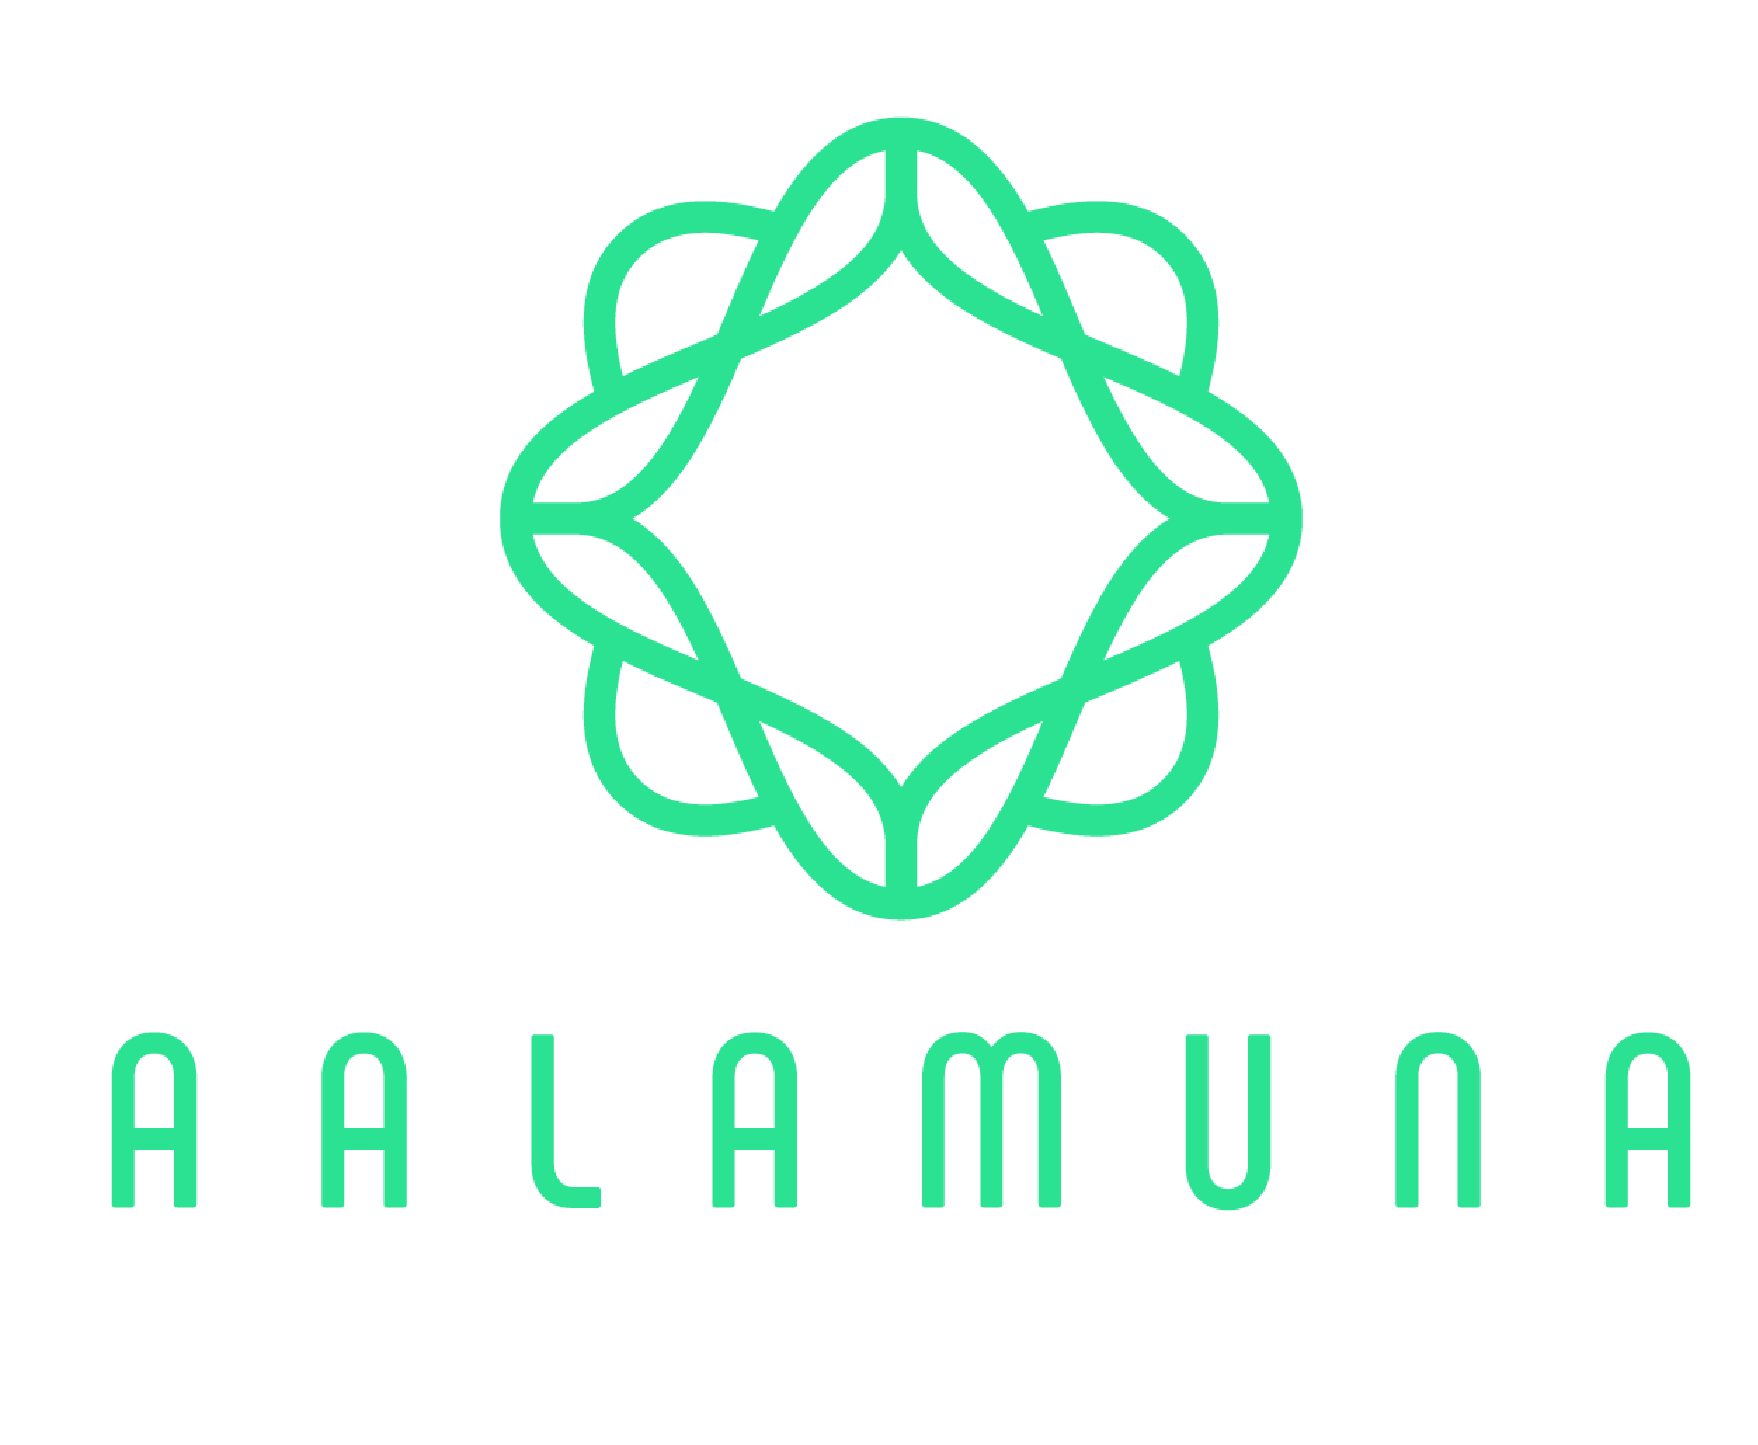 Aalamuna concet store objets du monde